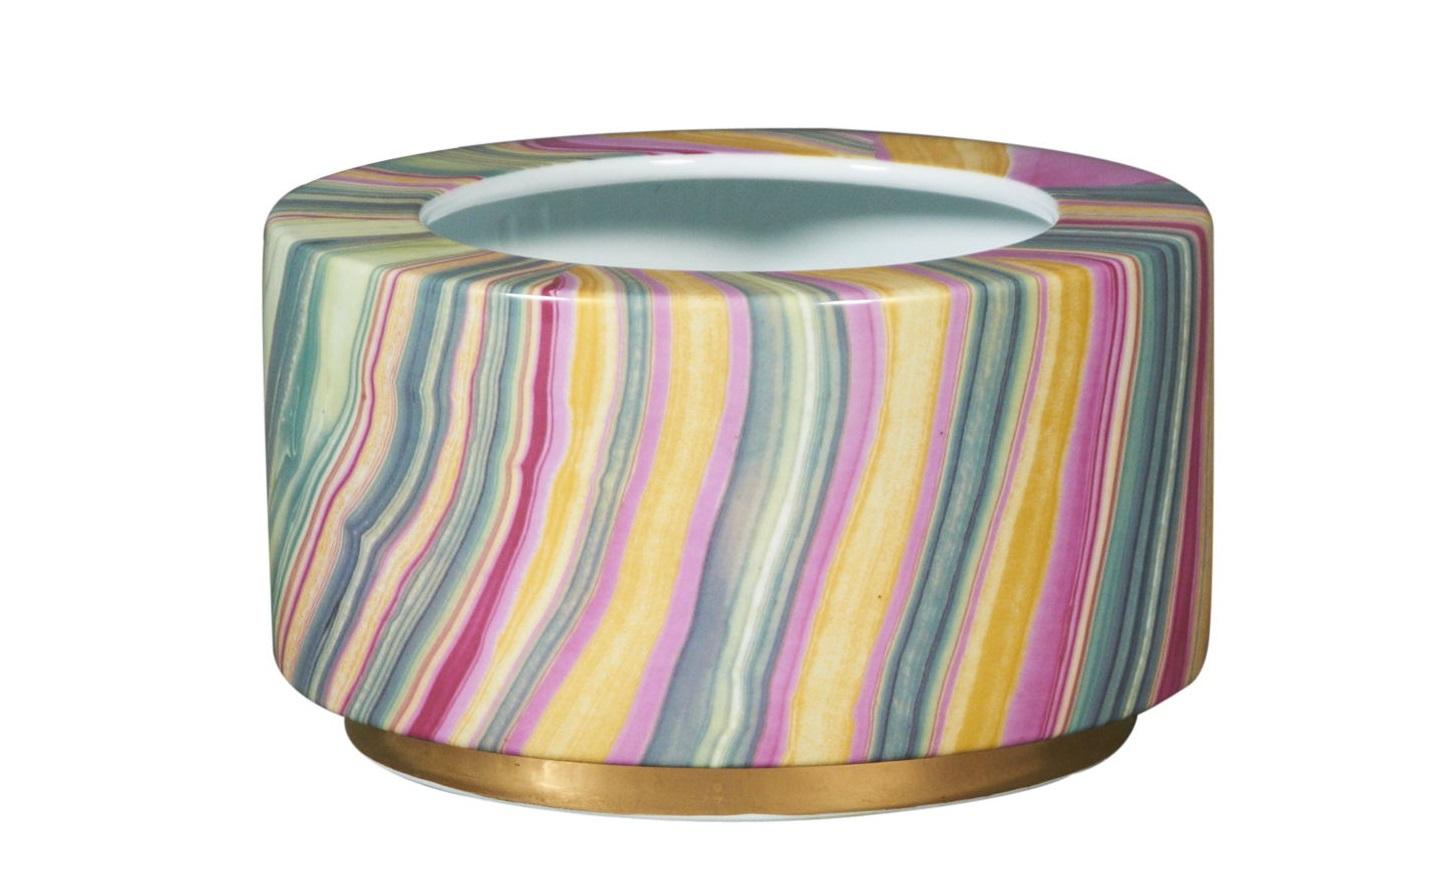 Ваза настольная RainbowВазы<br><br><br>Material: Керамика<br>Ширина см: 24<br>Высота см: 16<br>Глубина см: 24